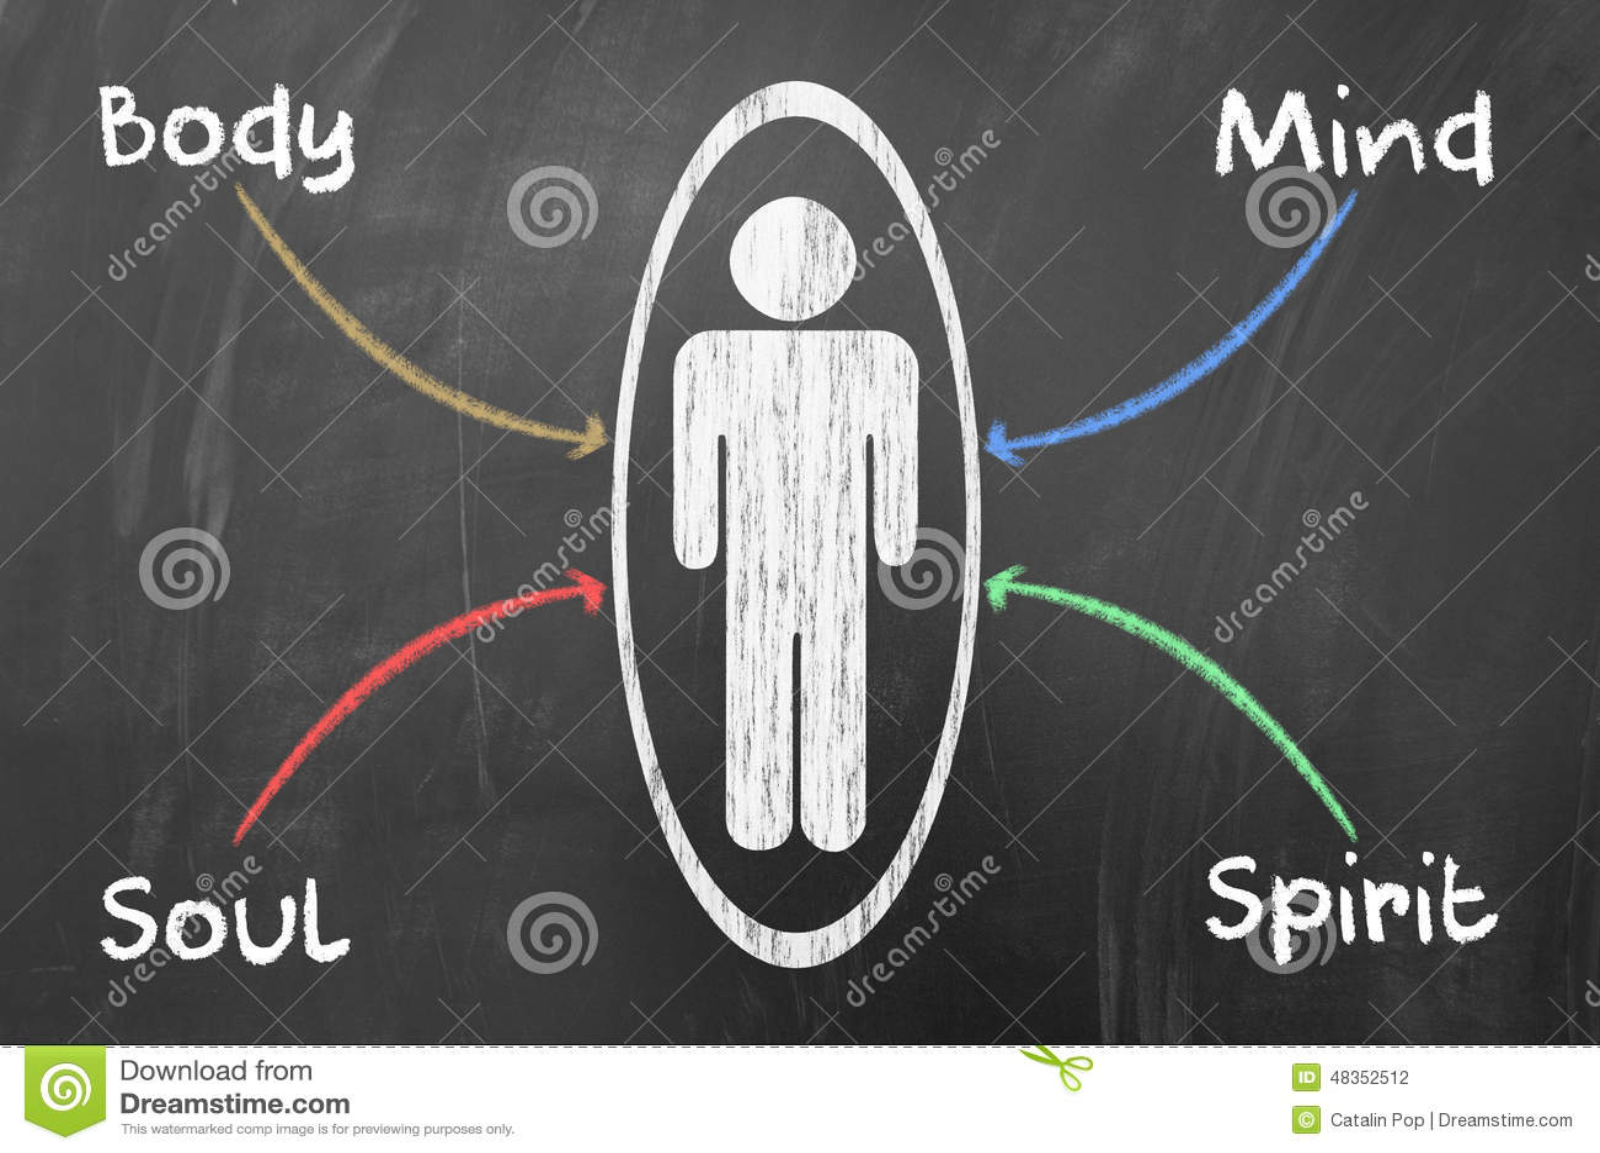 Equilibrio Mente E Espirito: Body, Mind, Soul And Spirit Stock Illustration